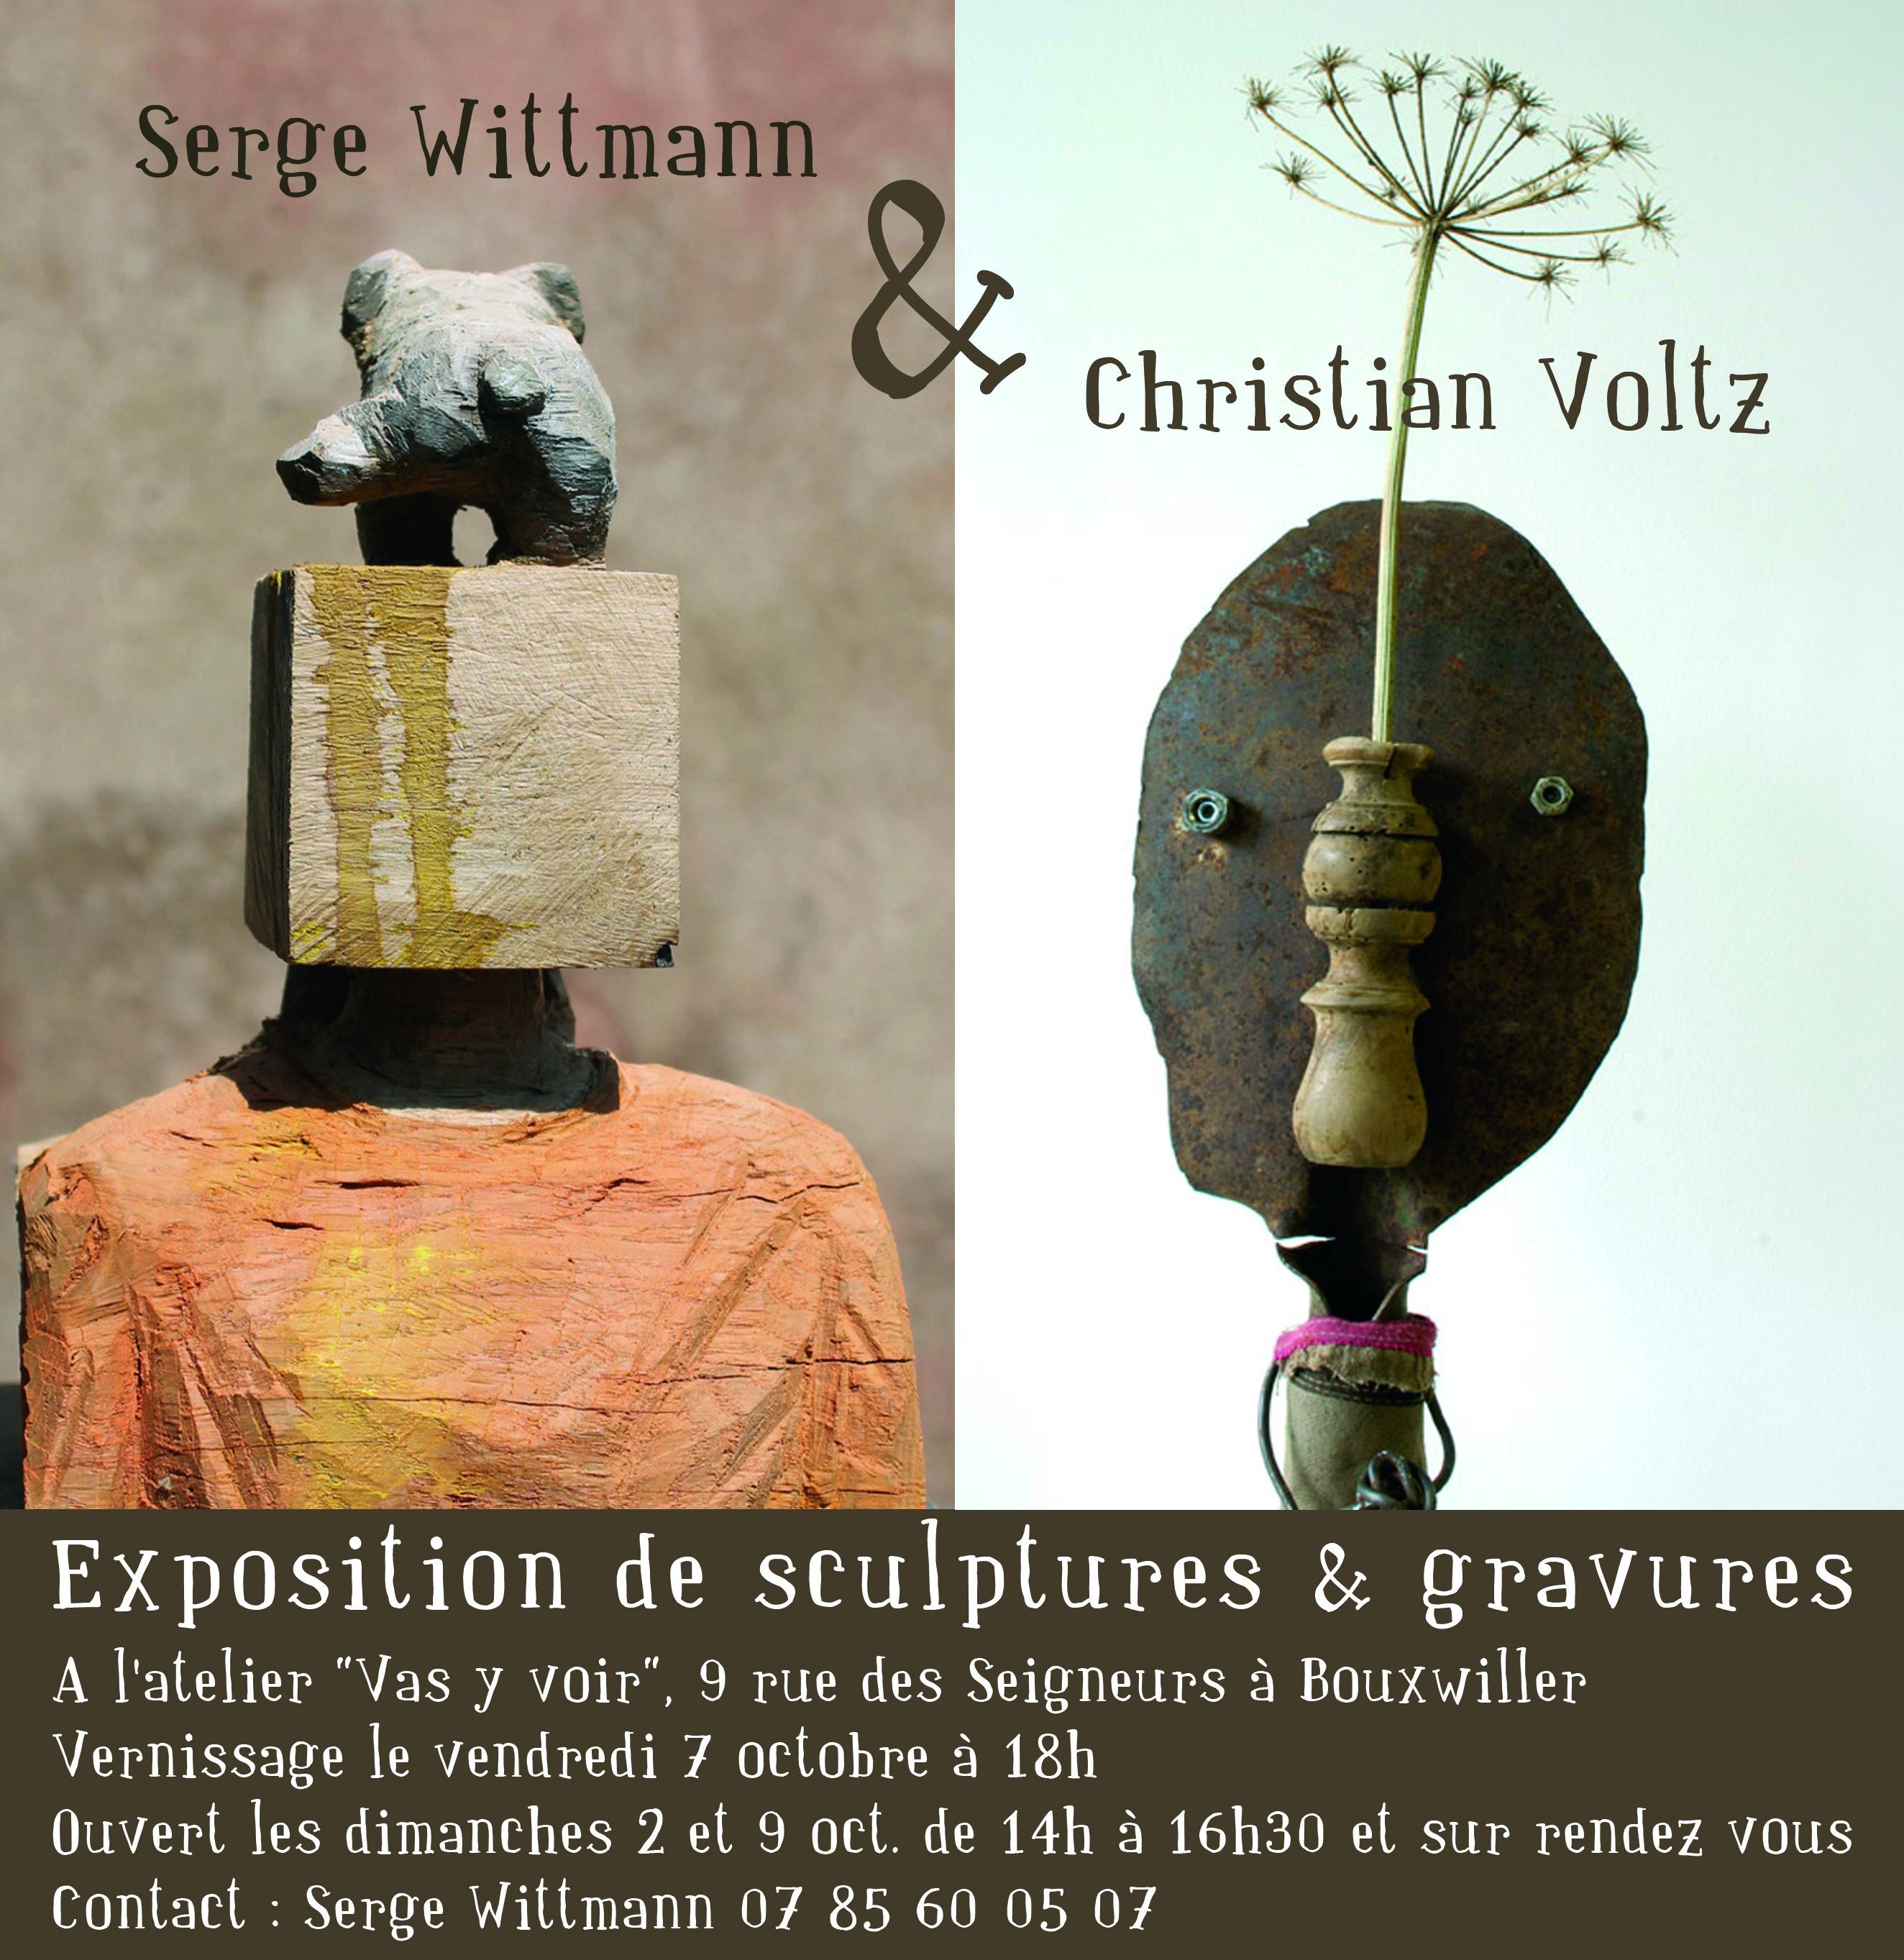 Expo-boux Wittmann/Voltz